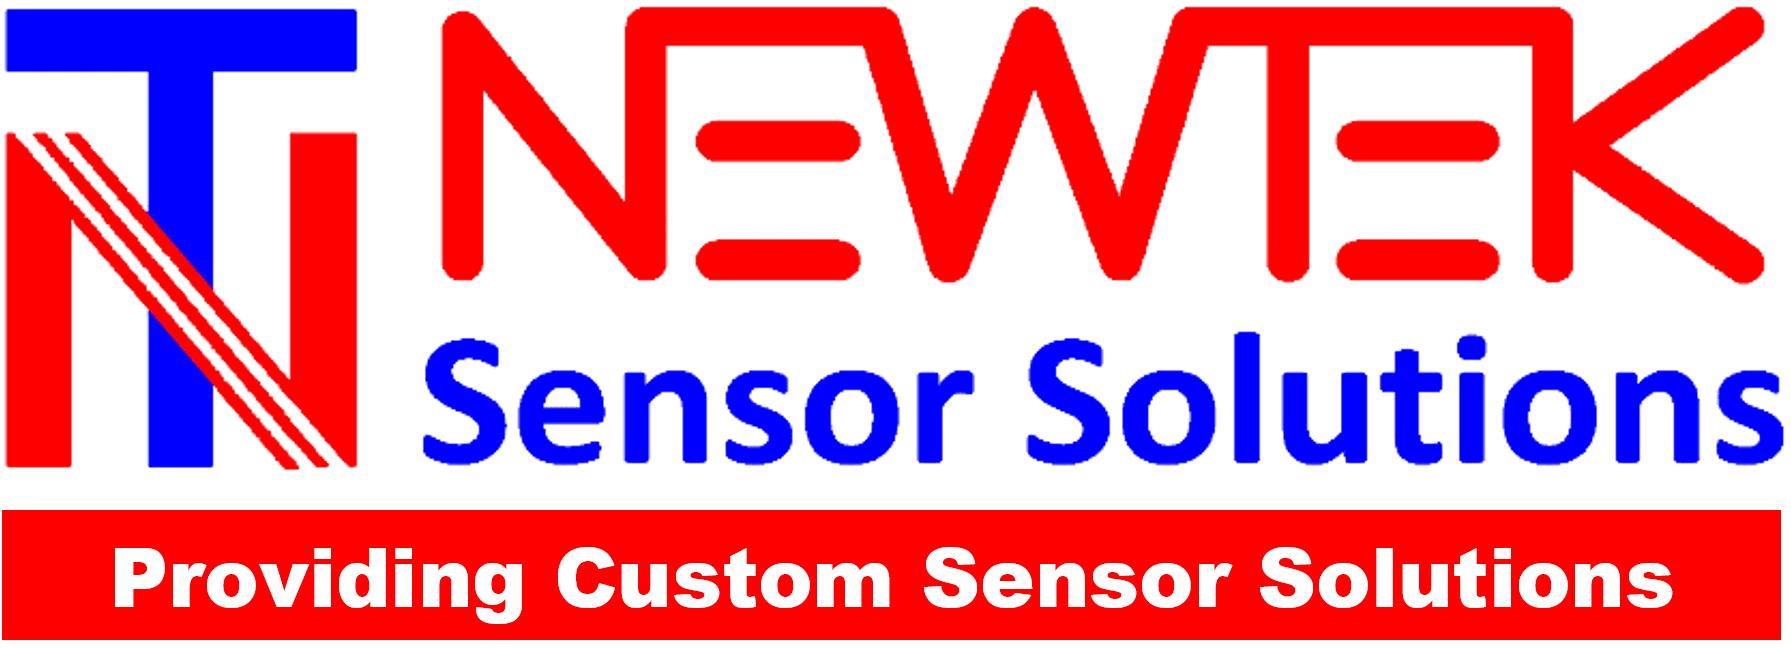 Newtek Sensors